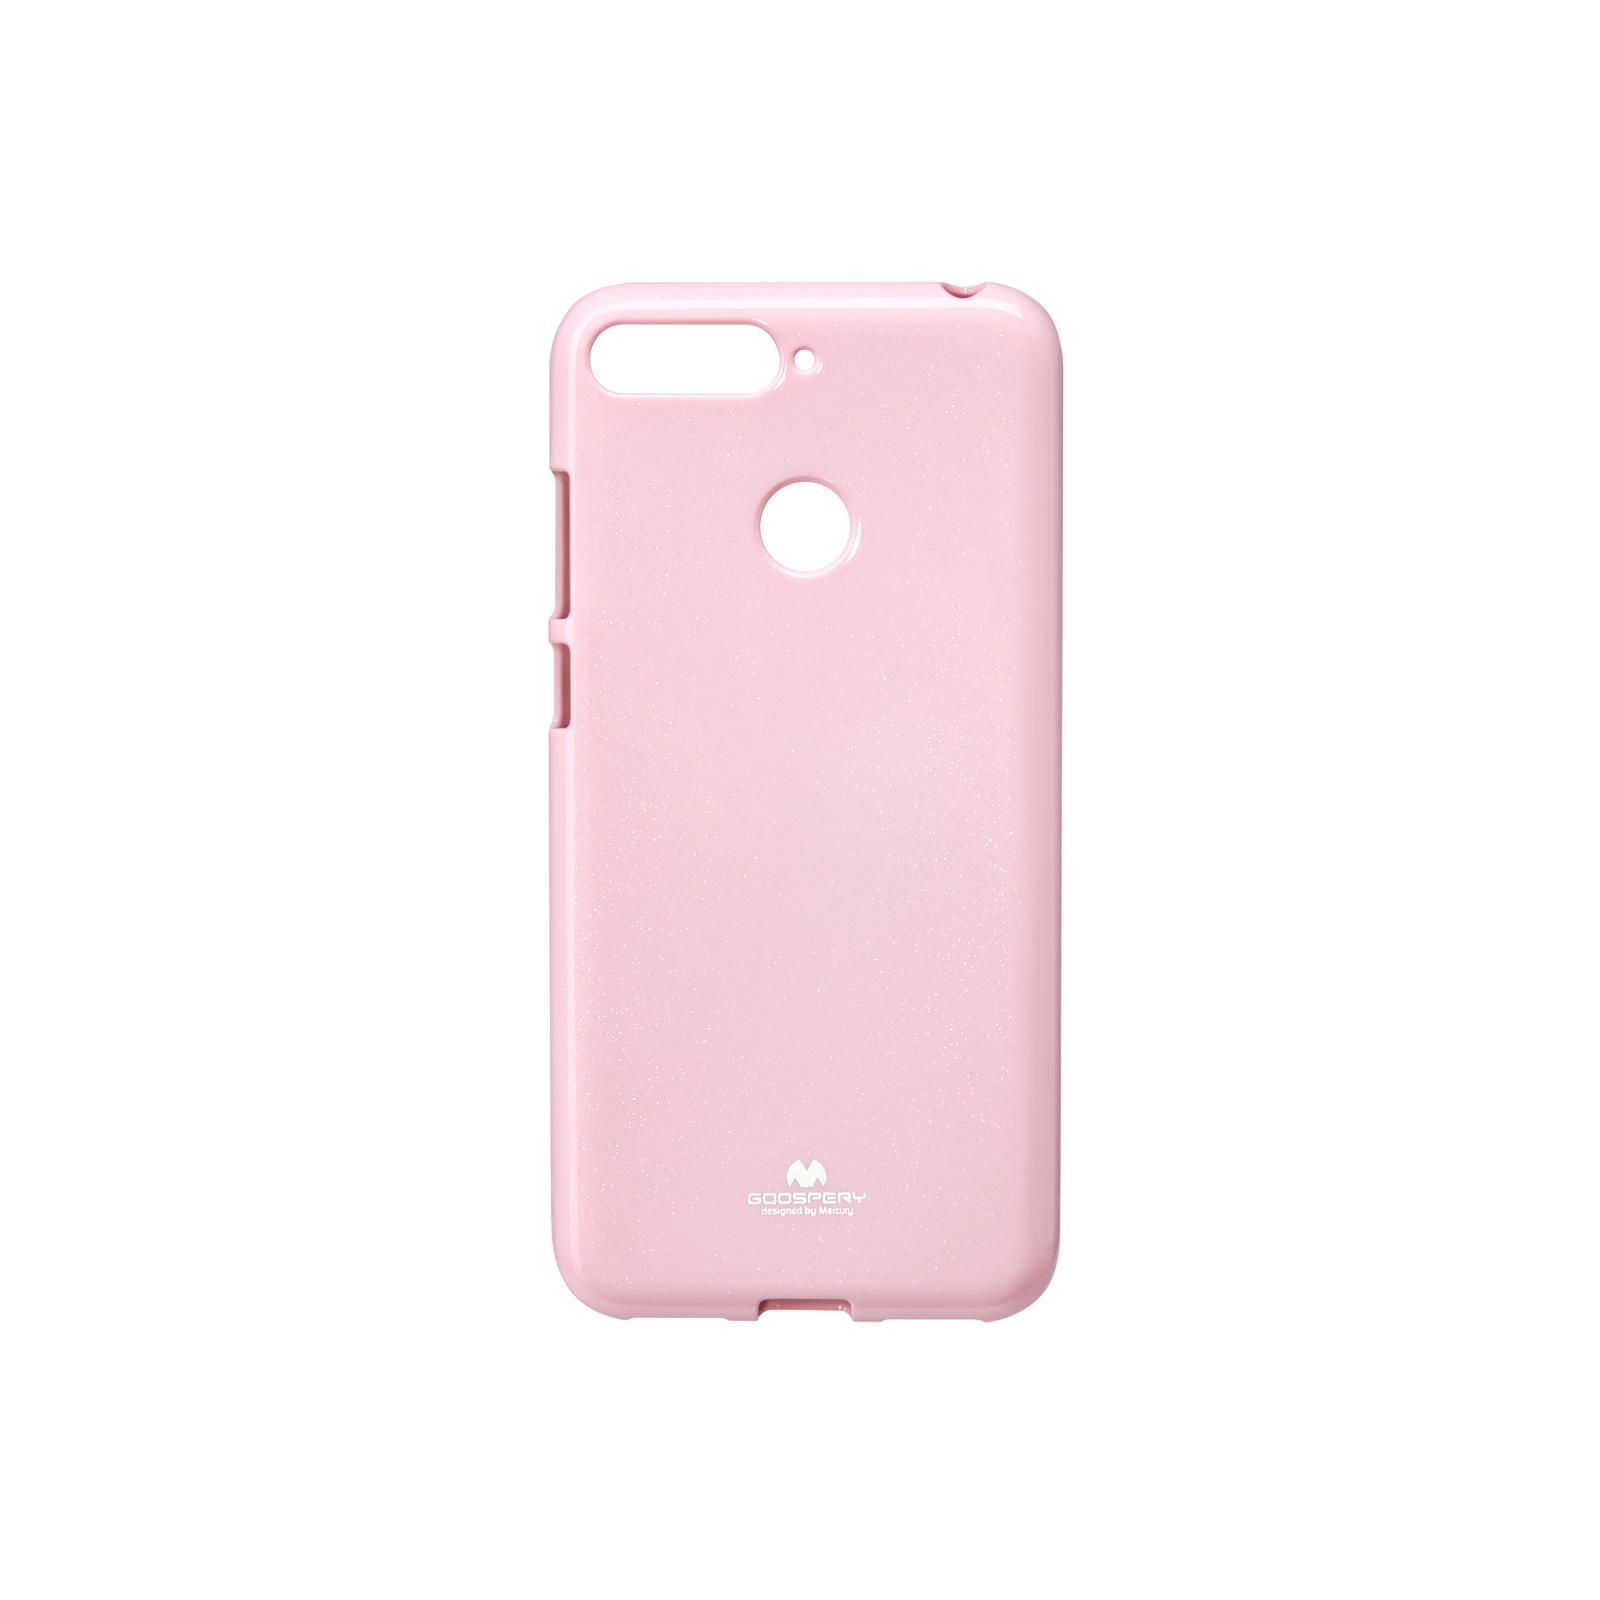 Чохол до моб. телефона Goospery Jelly Case для Huawei Y6 Prime 2018 Pink (8809610540577)